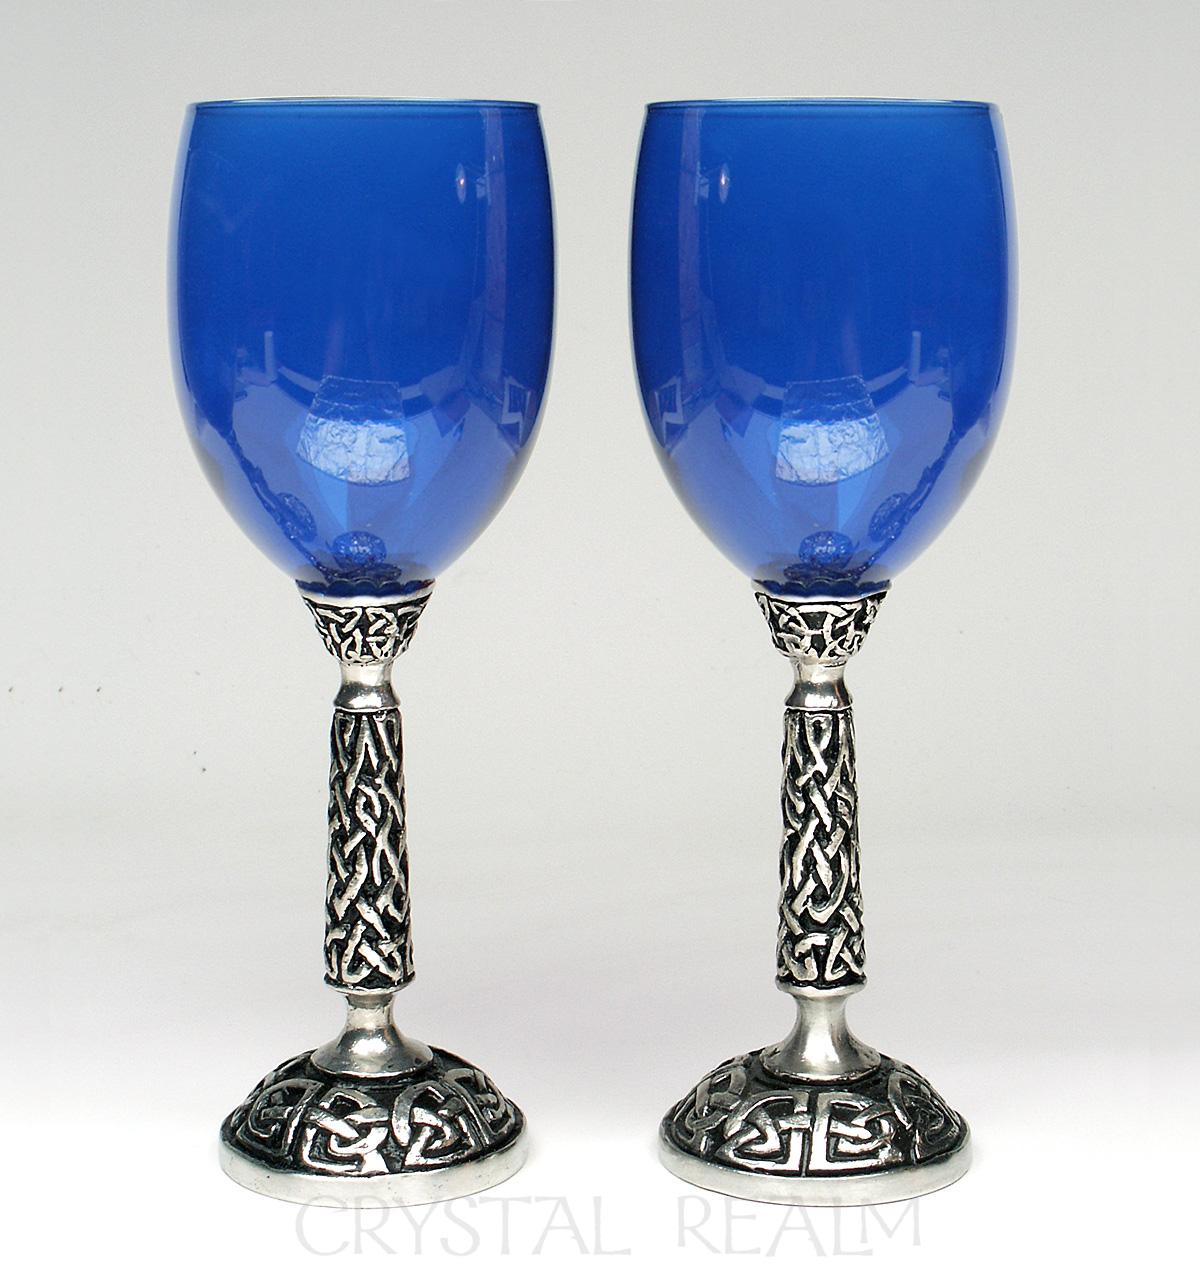 Royal blue wine glass or communion goblet with Celtic knotwork stem